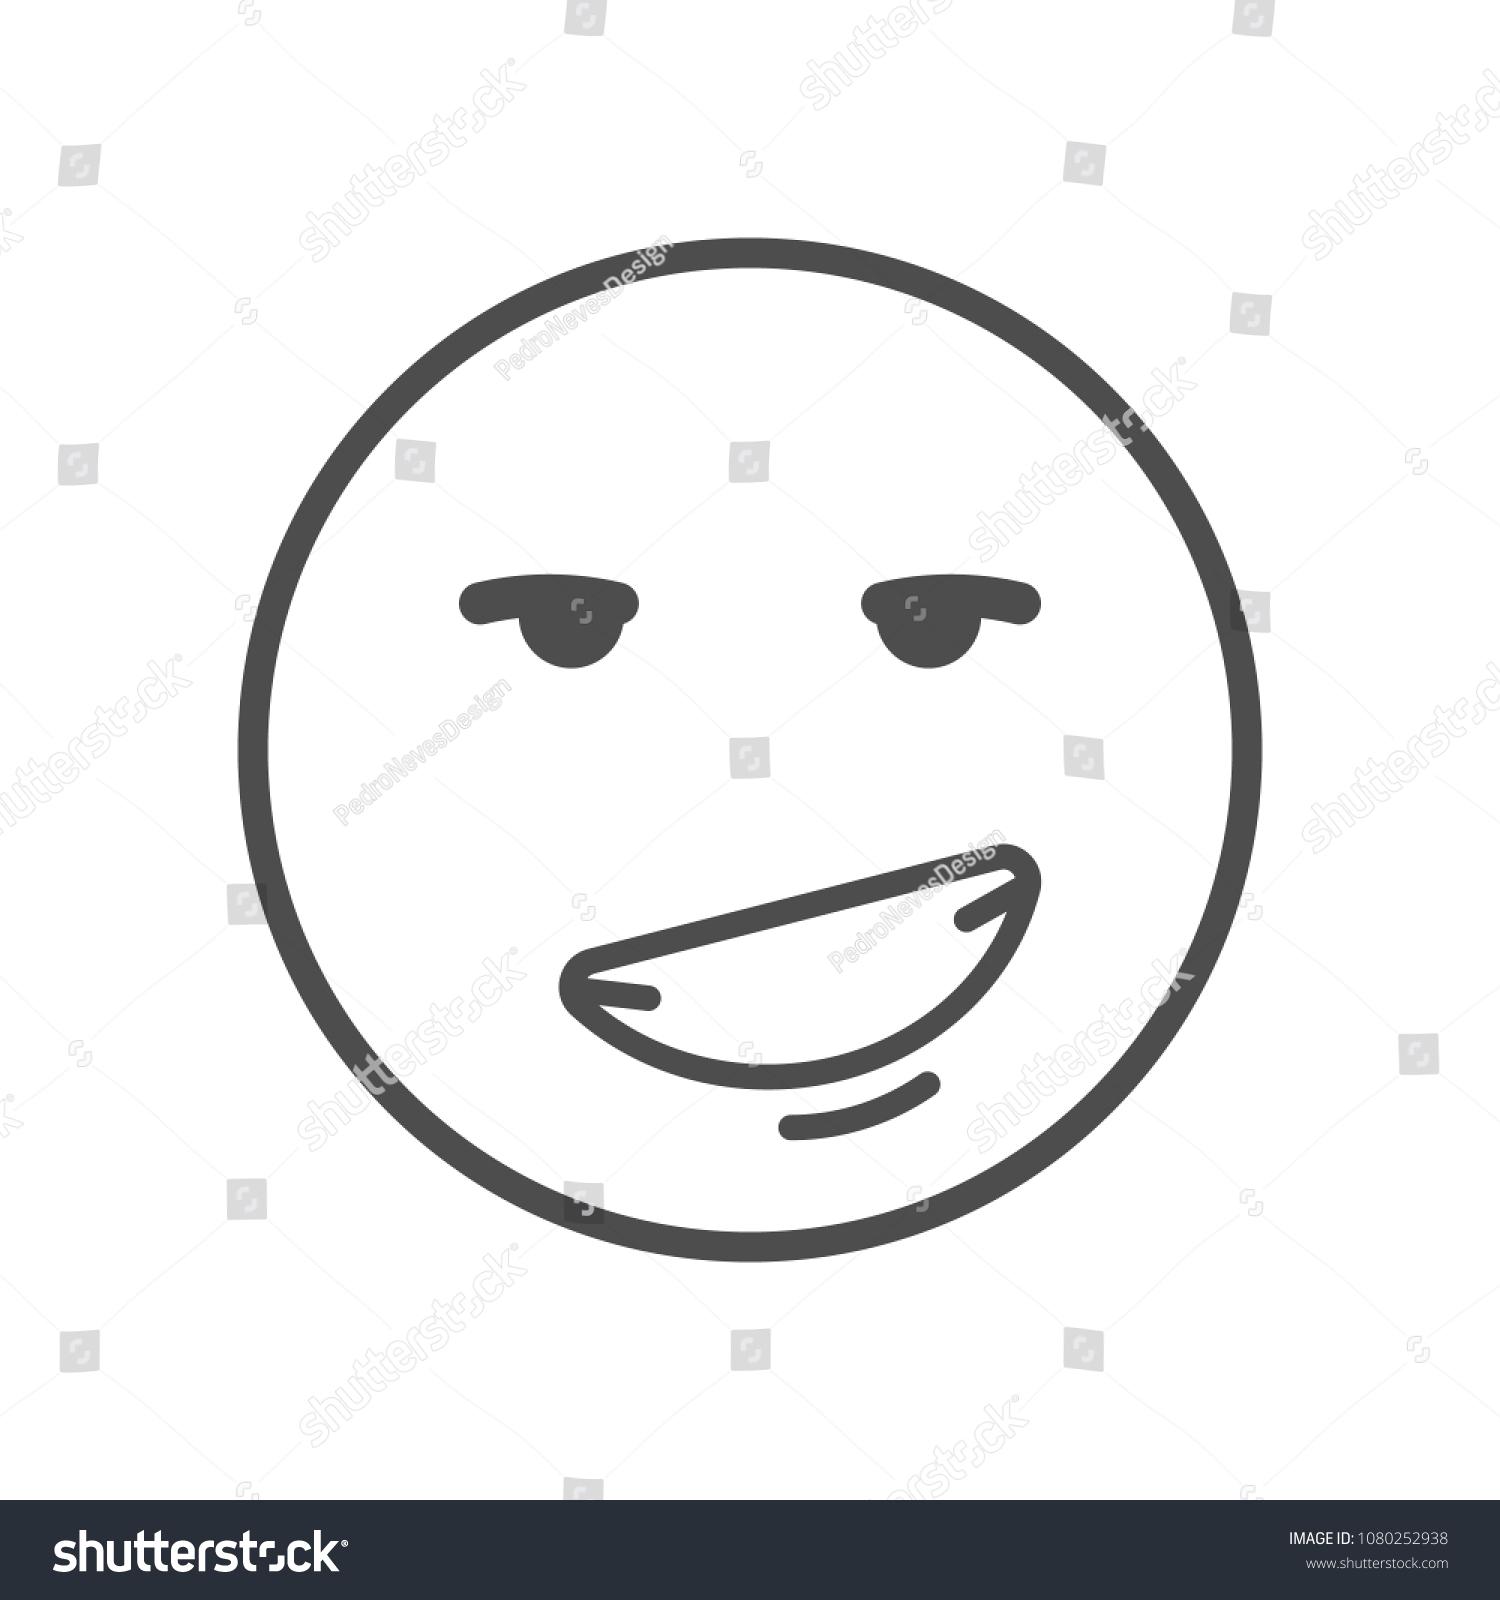 Flirting smiley